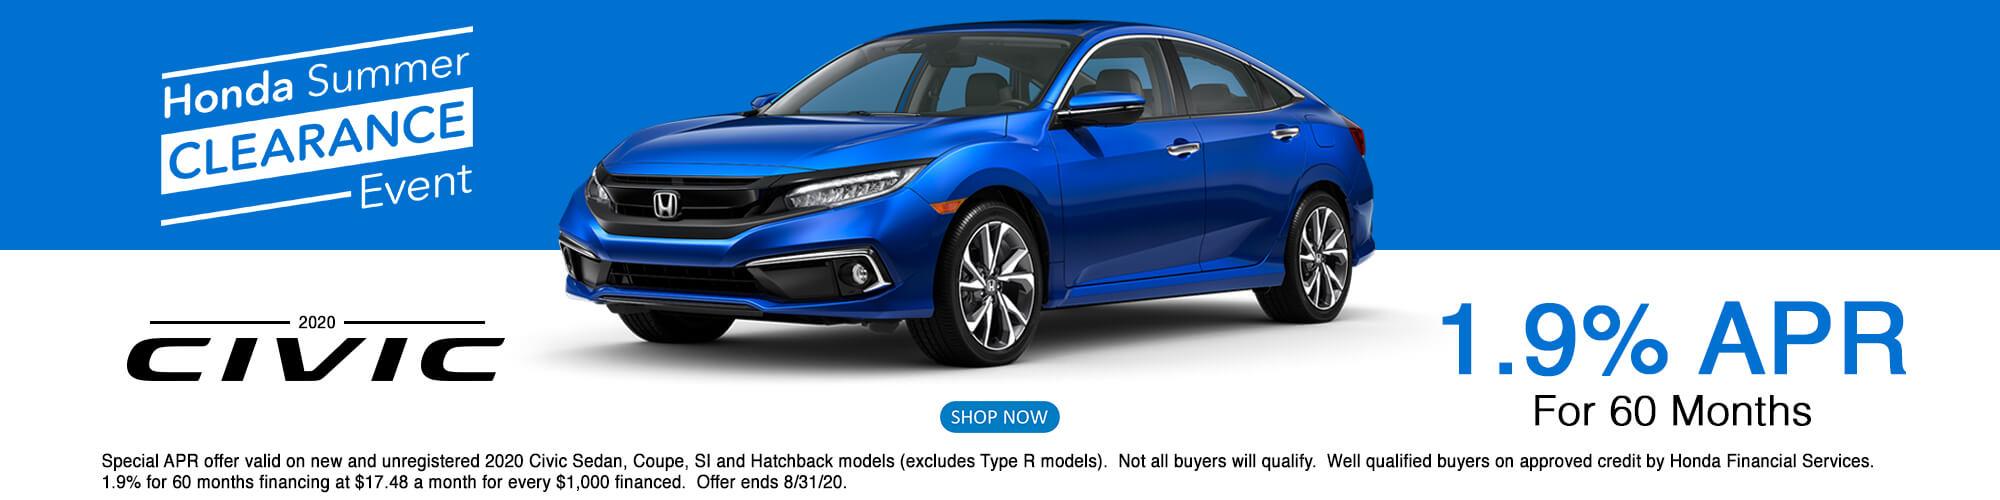 2020 Honda Civic APR Special